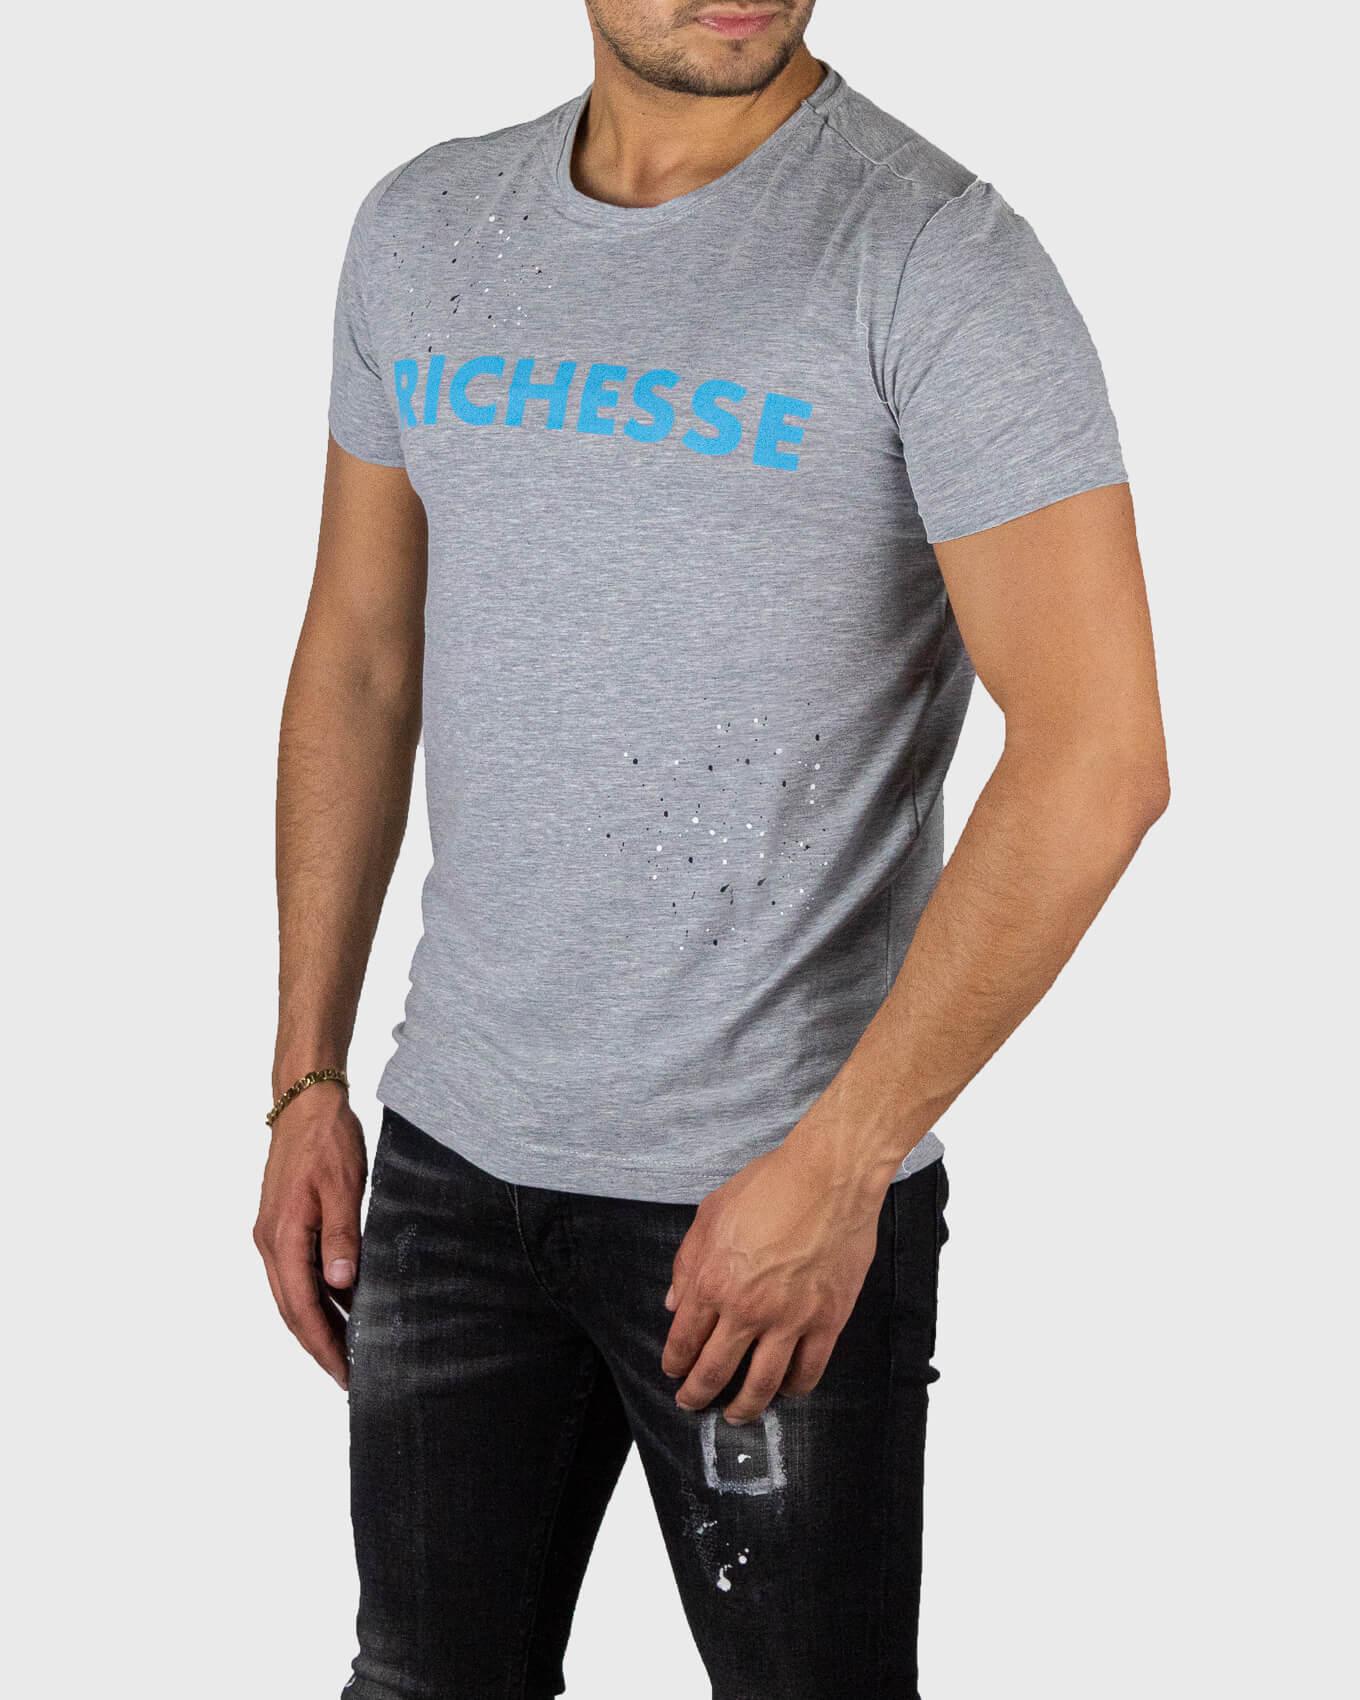 Orléans-Shirt-Grey-2019-1-1.jpg